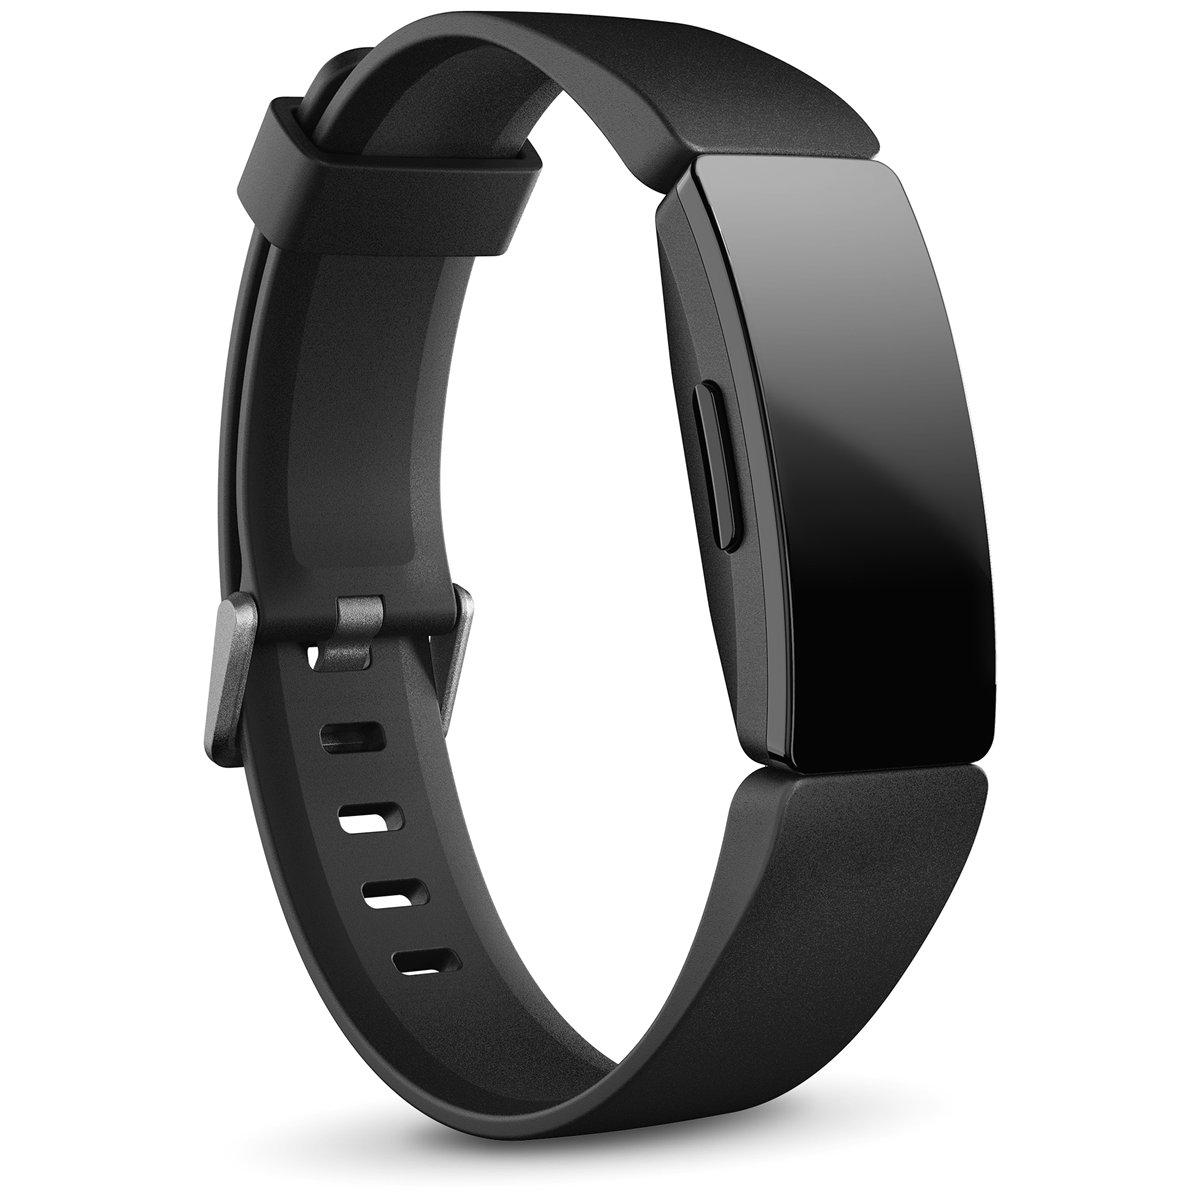 Fitbit フィットビット Inspire HR インスパイアHR フィットネス トラッカー ウェアラブル端末 腕時計 L/Sサイズ ブラック FB413BKBK-FRCJK